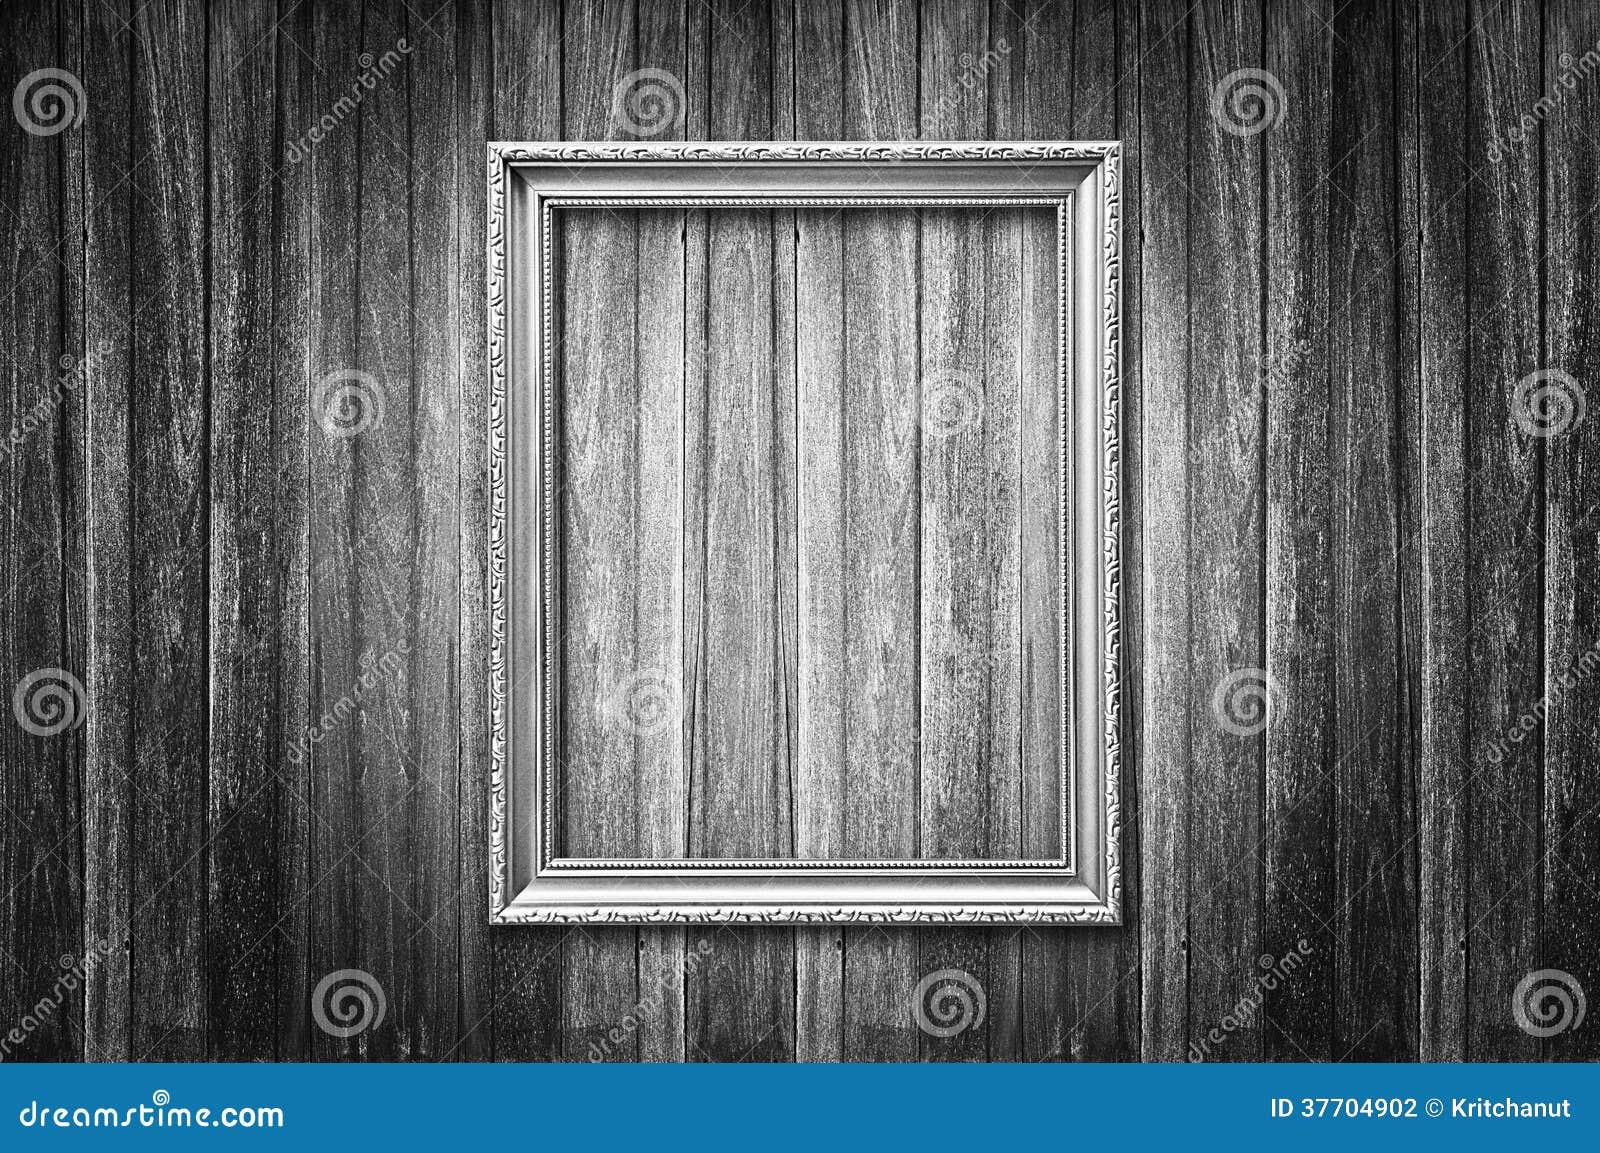 Im Altem Stil Bilderrahmen Auf Dunkler Hölzerner Wand Stockfoto ...